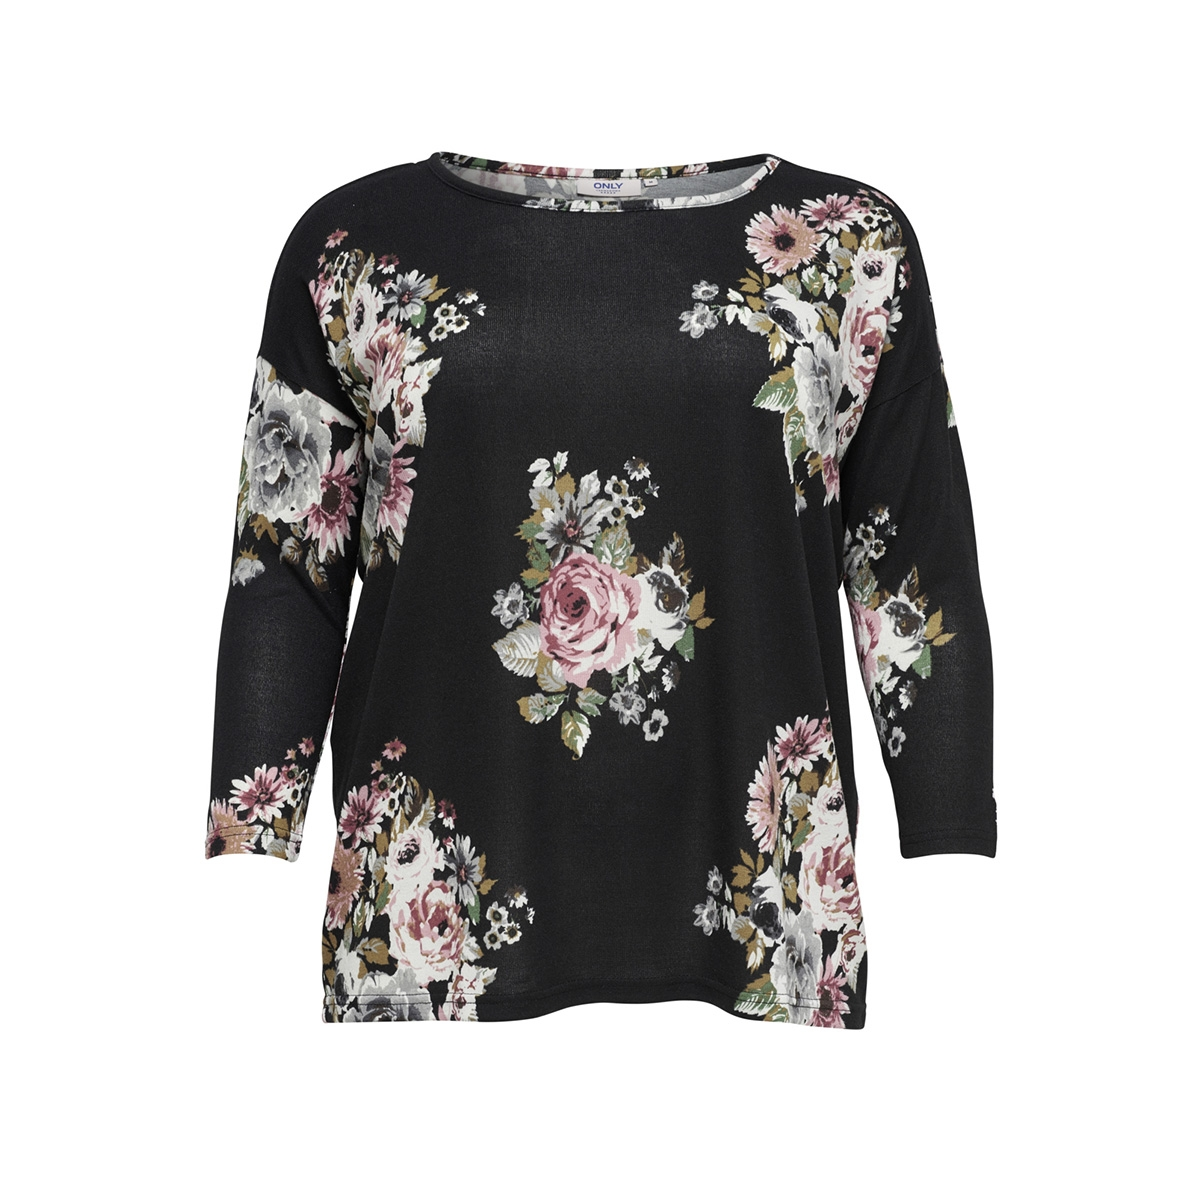 Caralba 34 Top 15164534 Only Carmakoma T Shirt Blackflowers